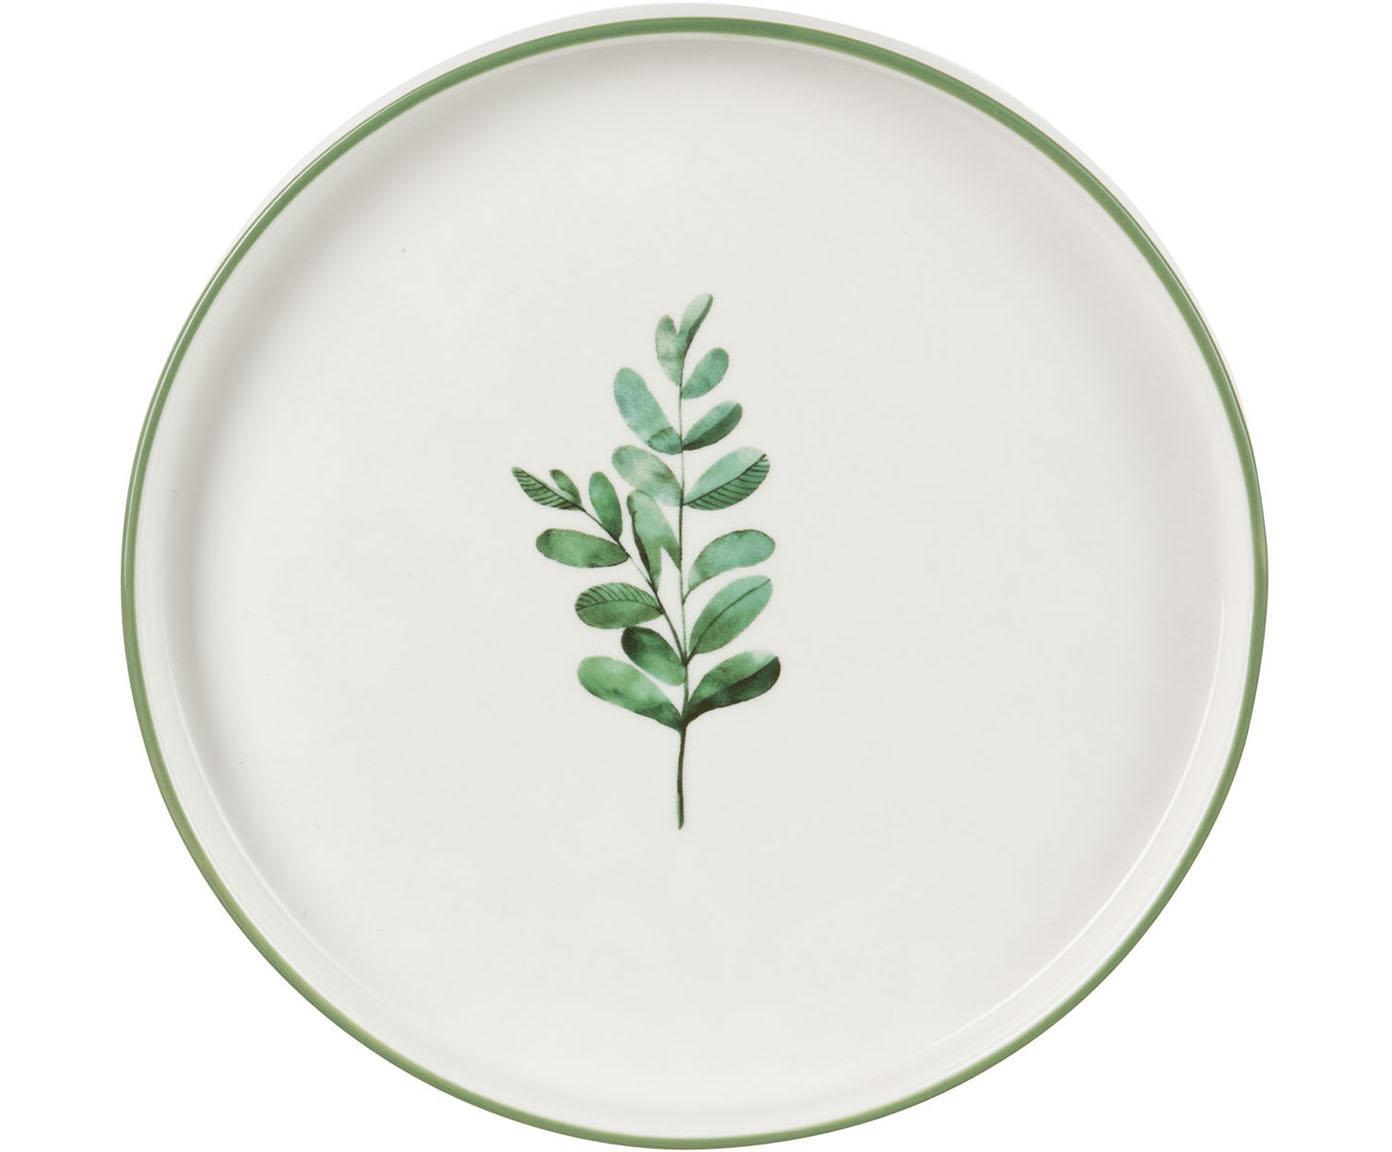 Piattino da dessert Eukalyptus 4 pz, Porcellana, Bianco, verde, Ø 24 cm